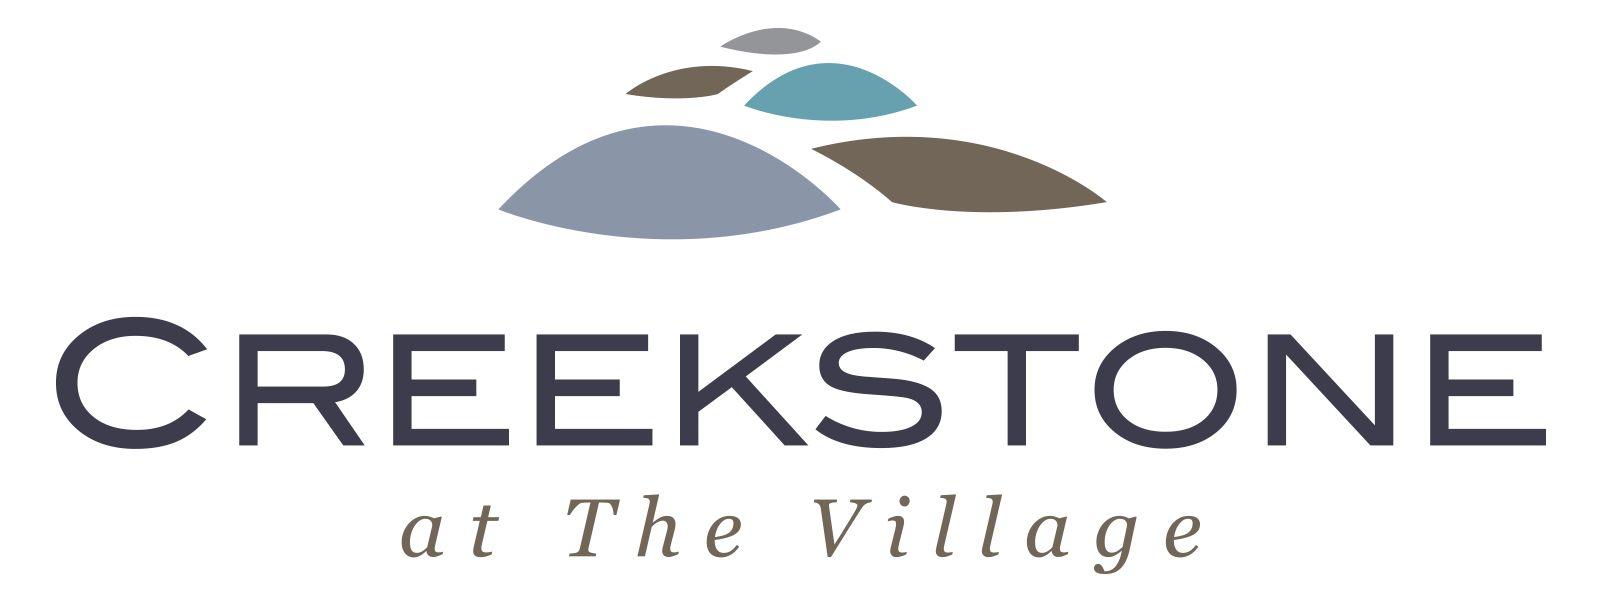 Creekstone at the Village,93420